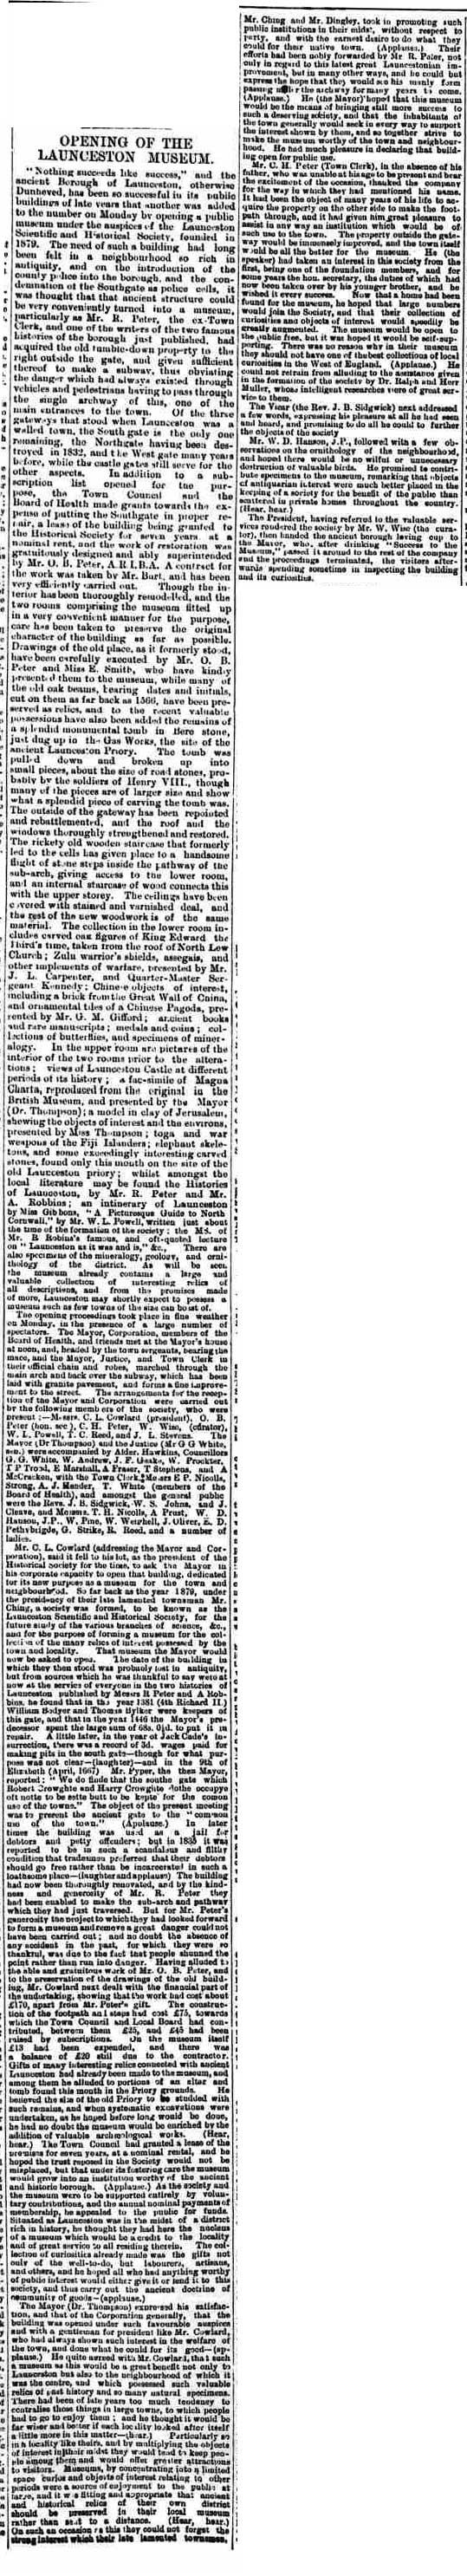 16 June 1888